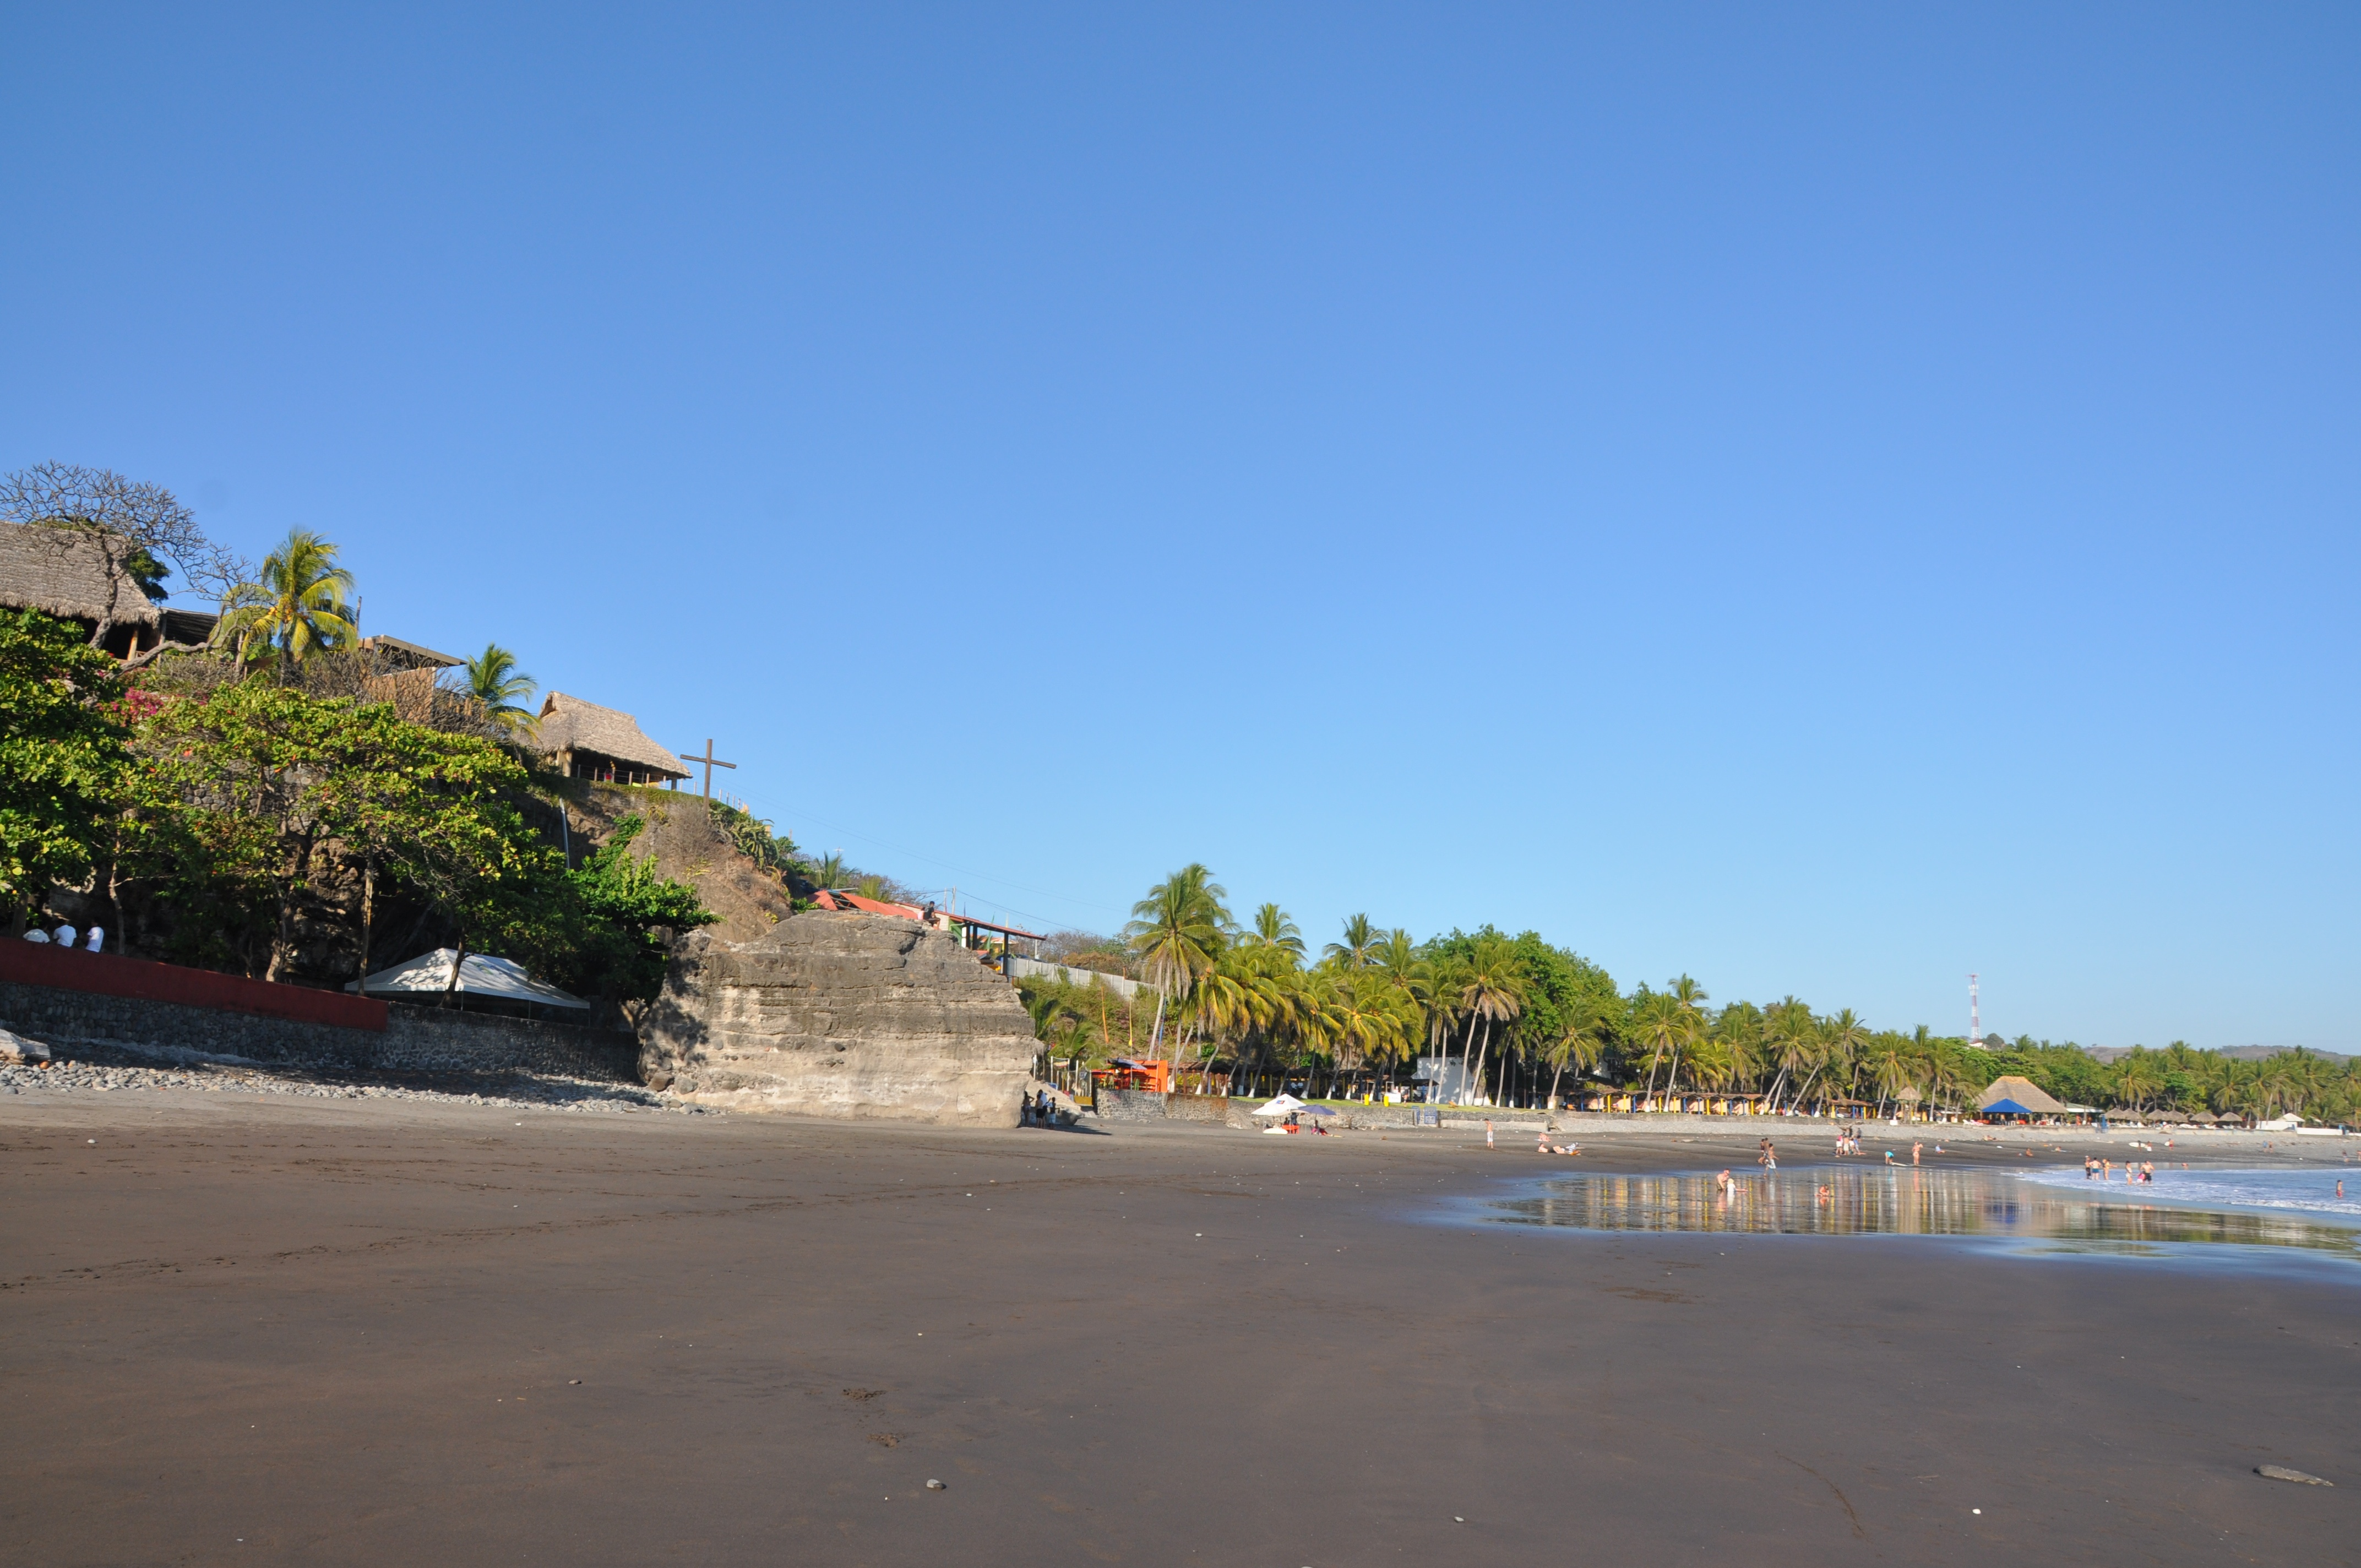 At the El Sunzal point at Playa El Tunco, El Salvador.